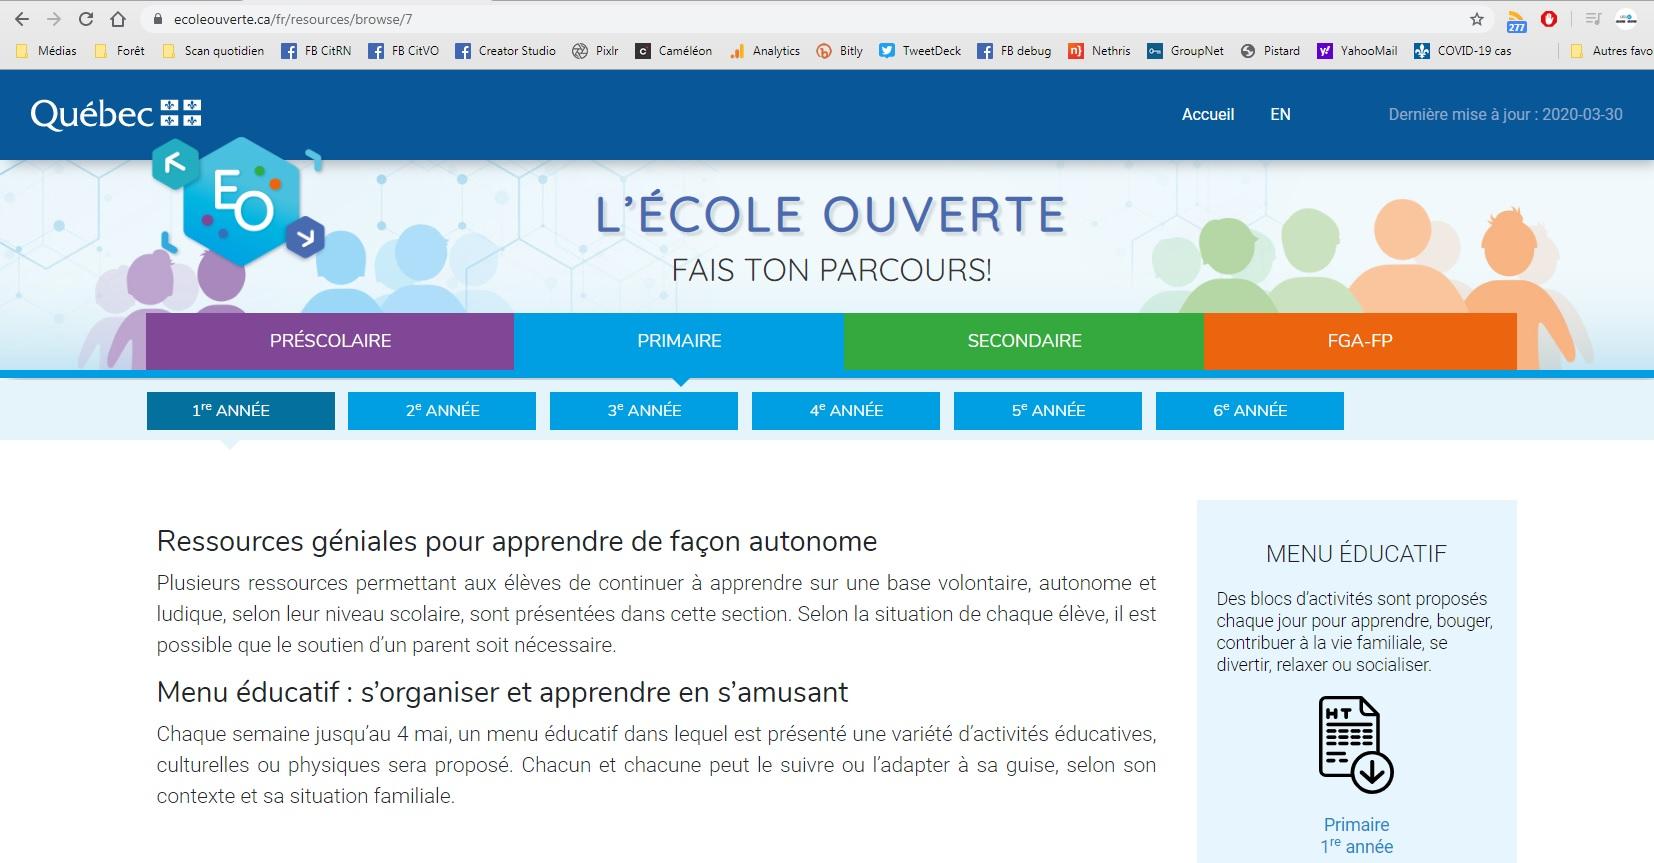 Ecole_ouverte